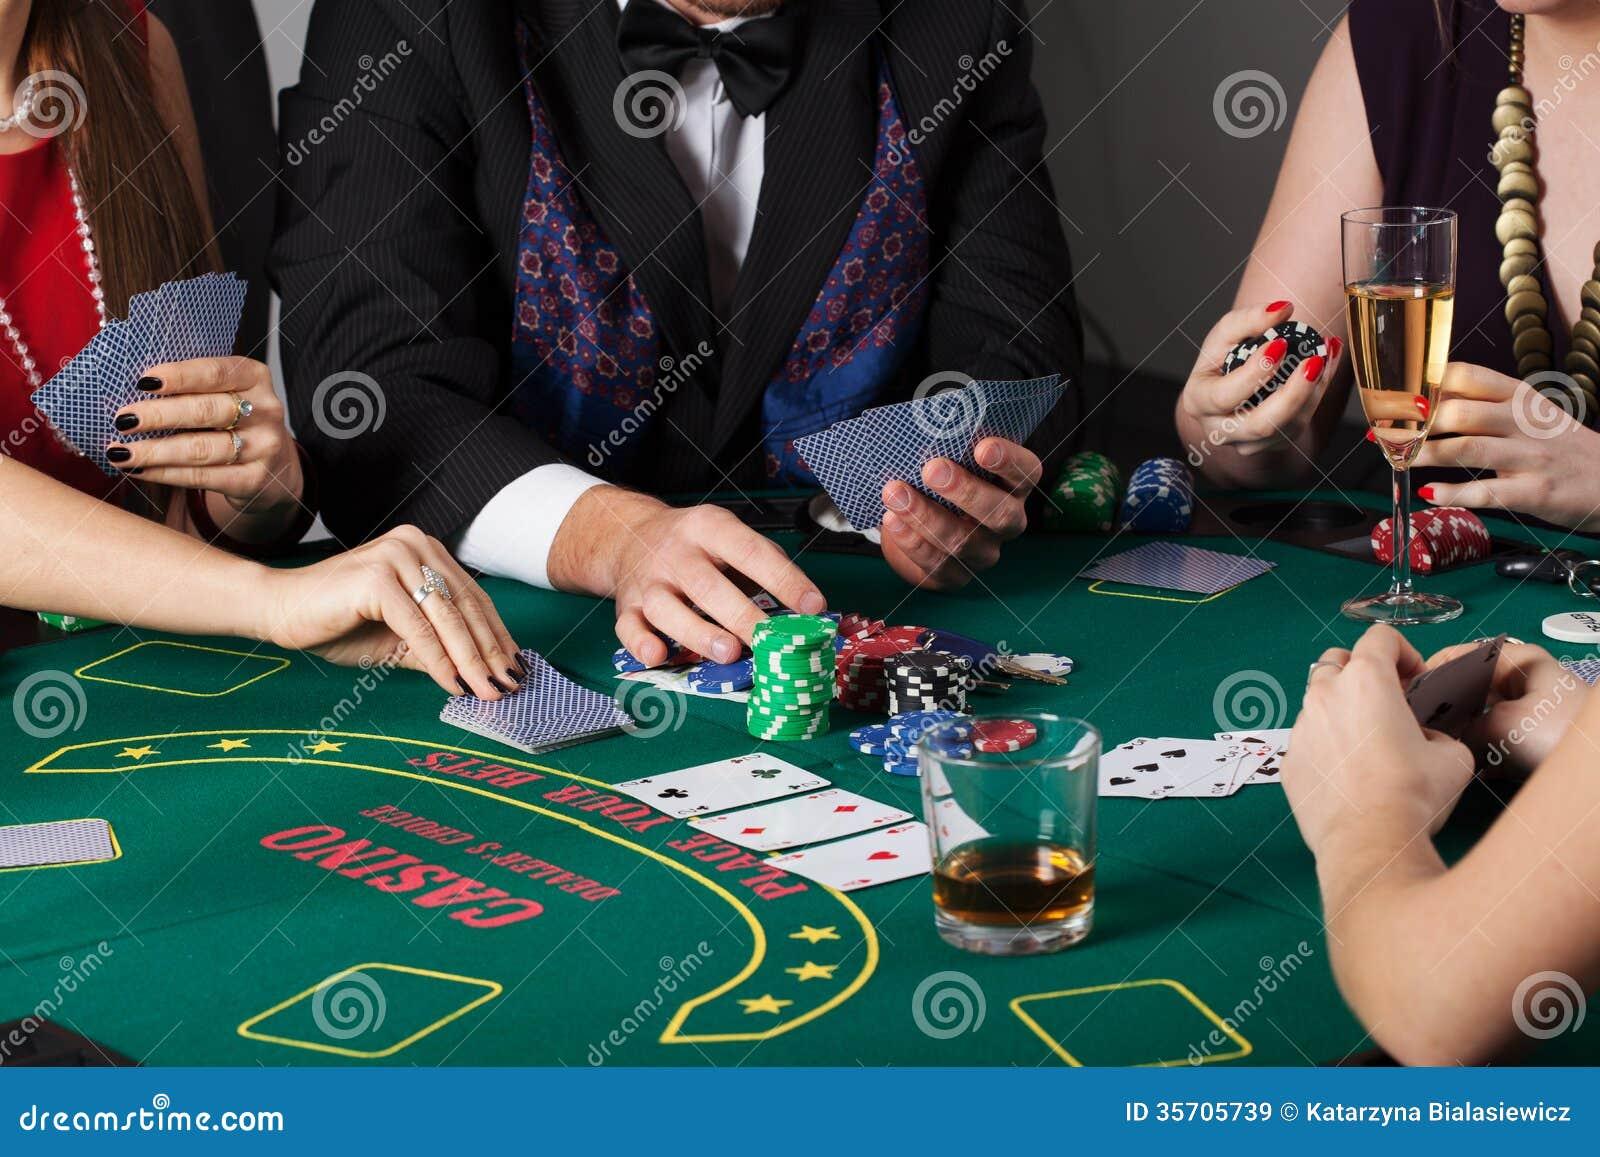 Rich Casino Times 203161